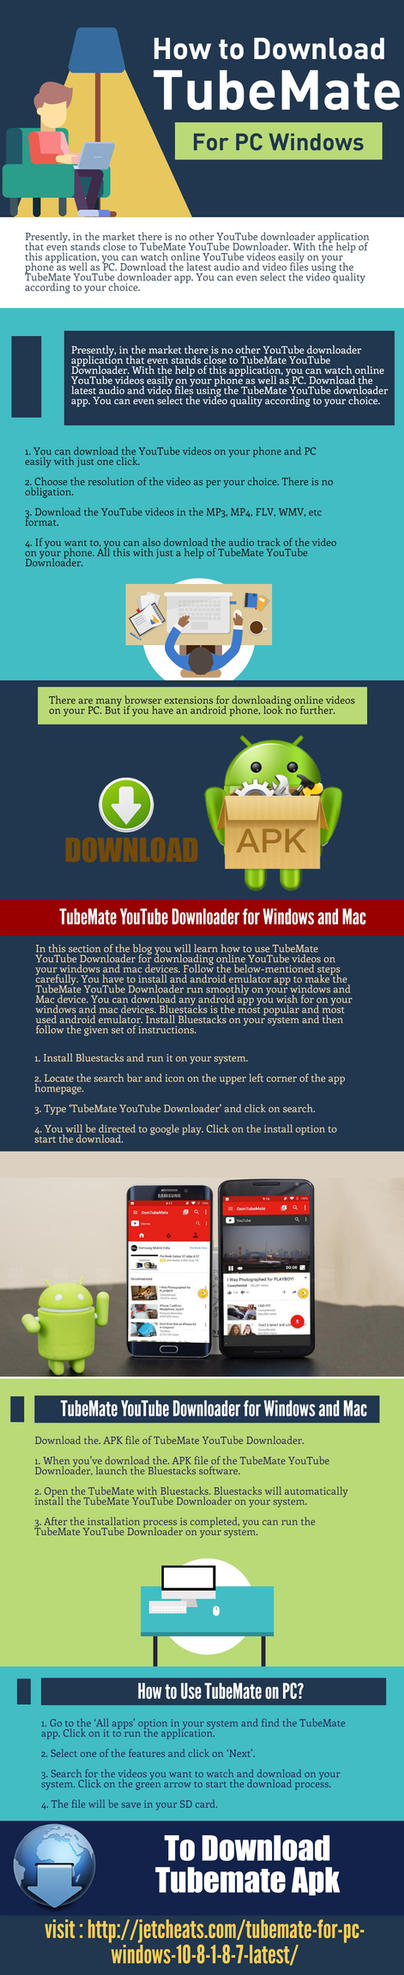 tubemate youtube downloader for windows 8.1